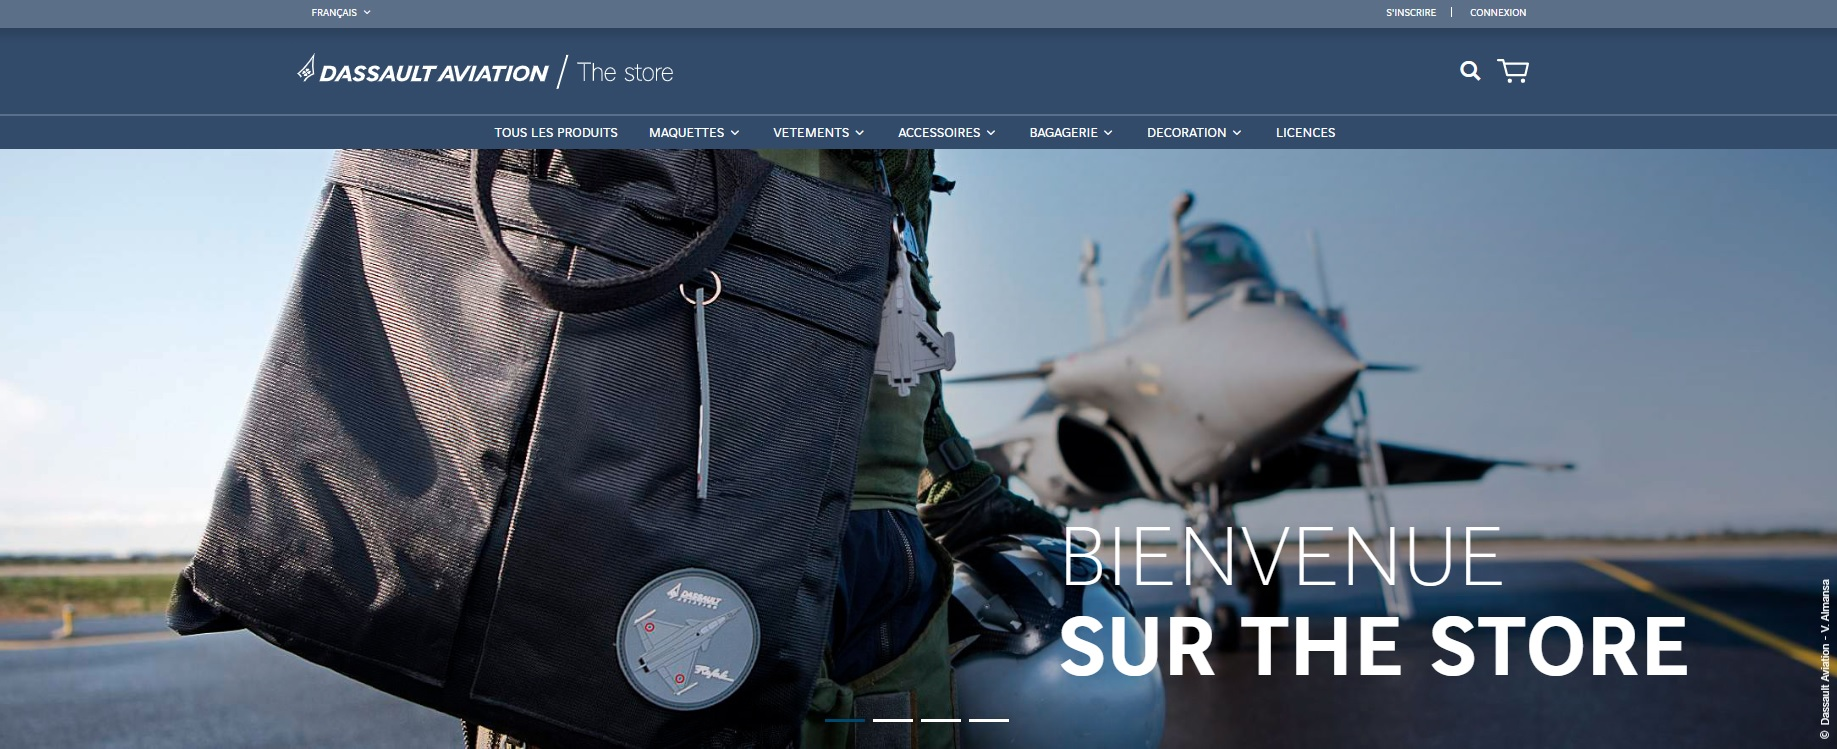 Boutique The Store – Dassault Aviation